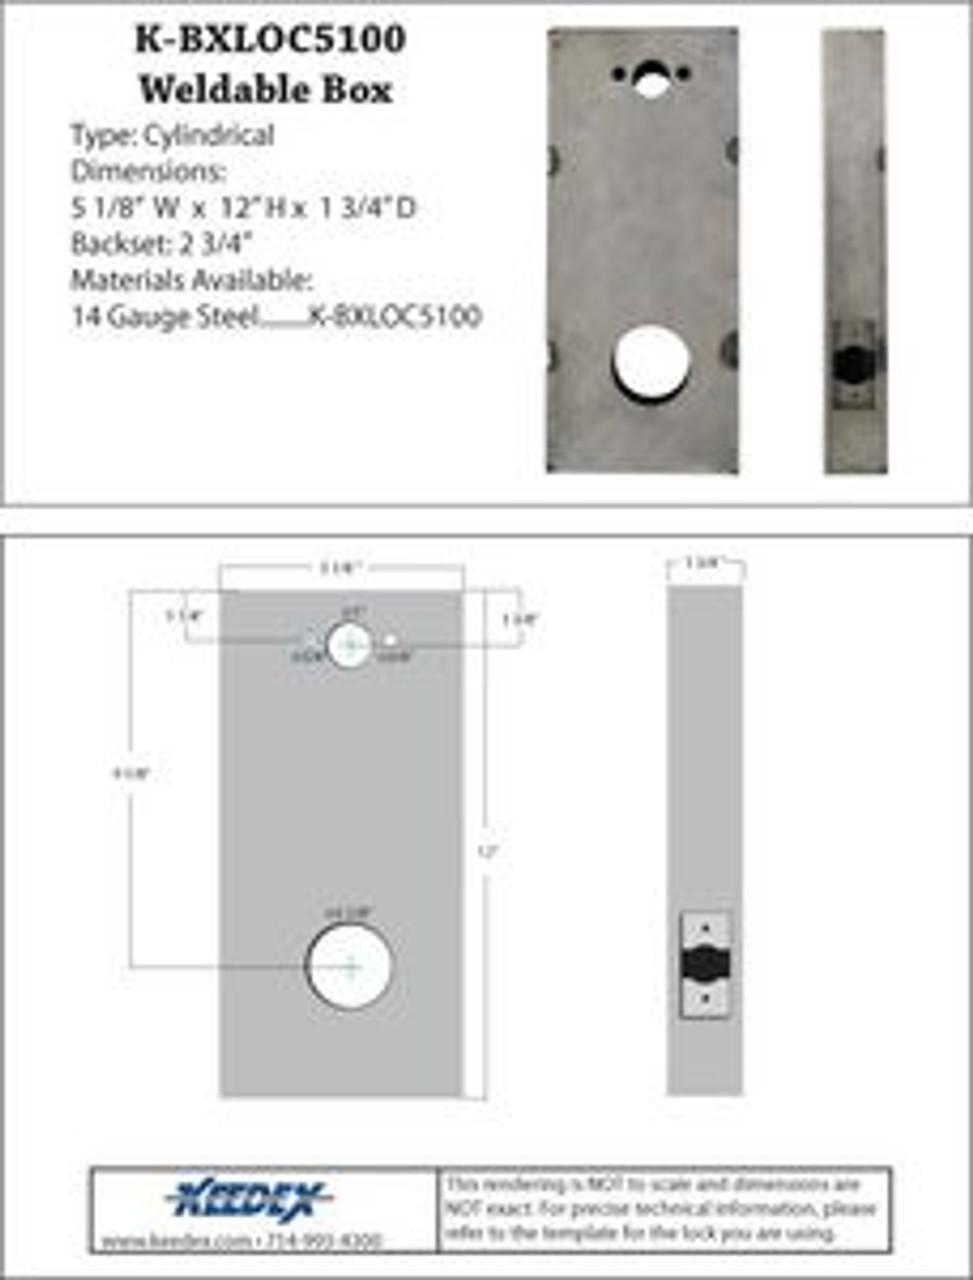 Keedex K-BXLOC5100 Weldable Box